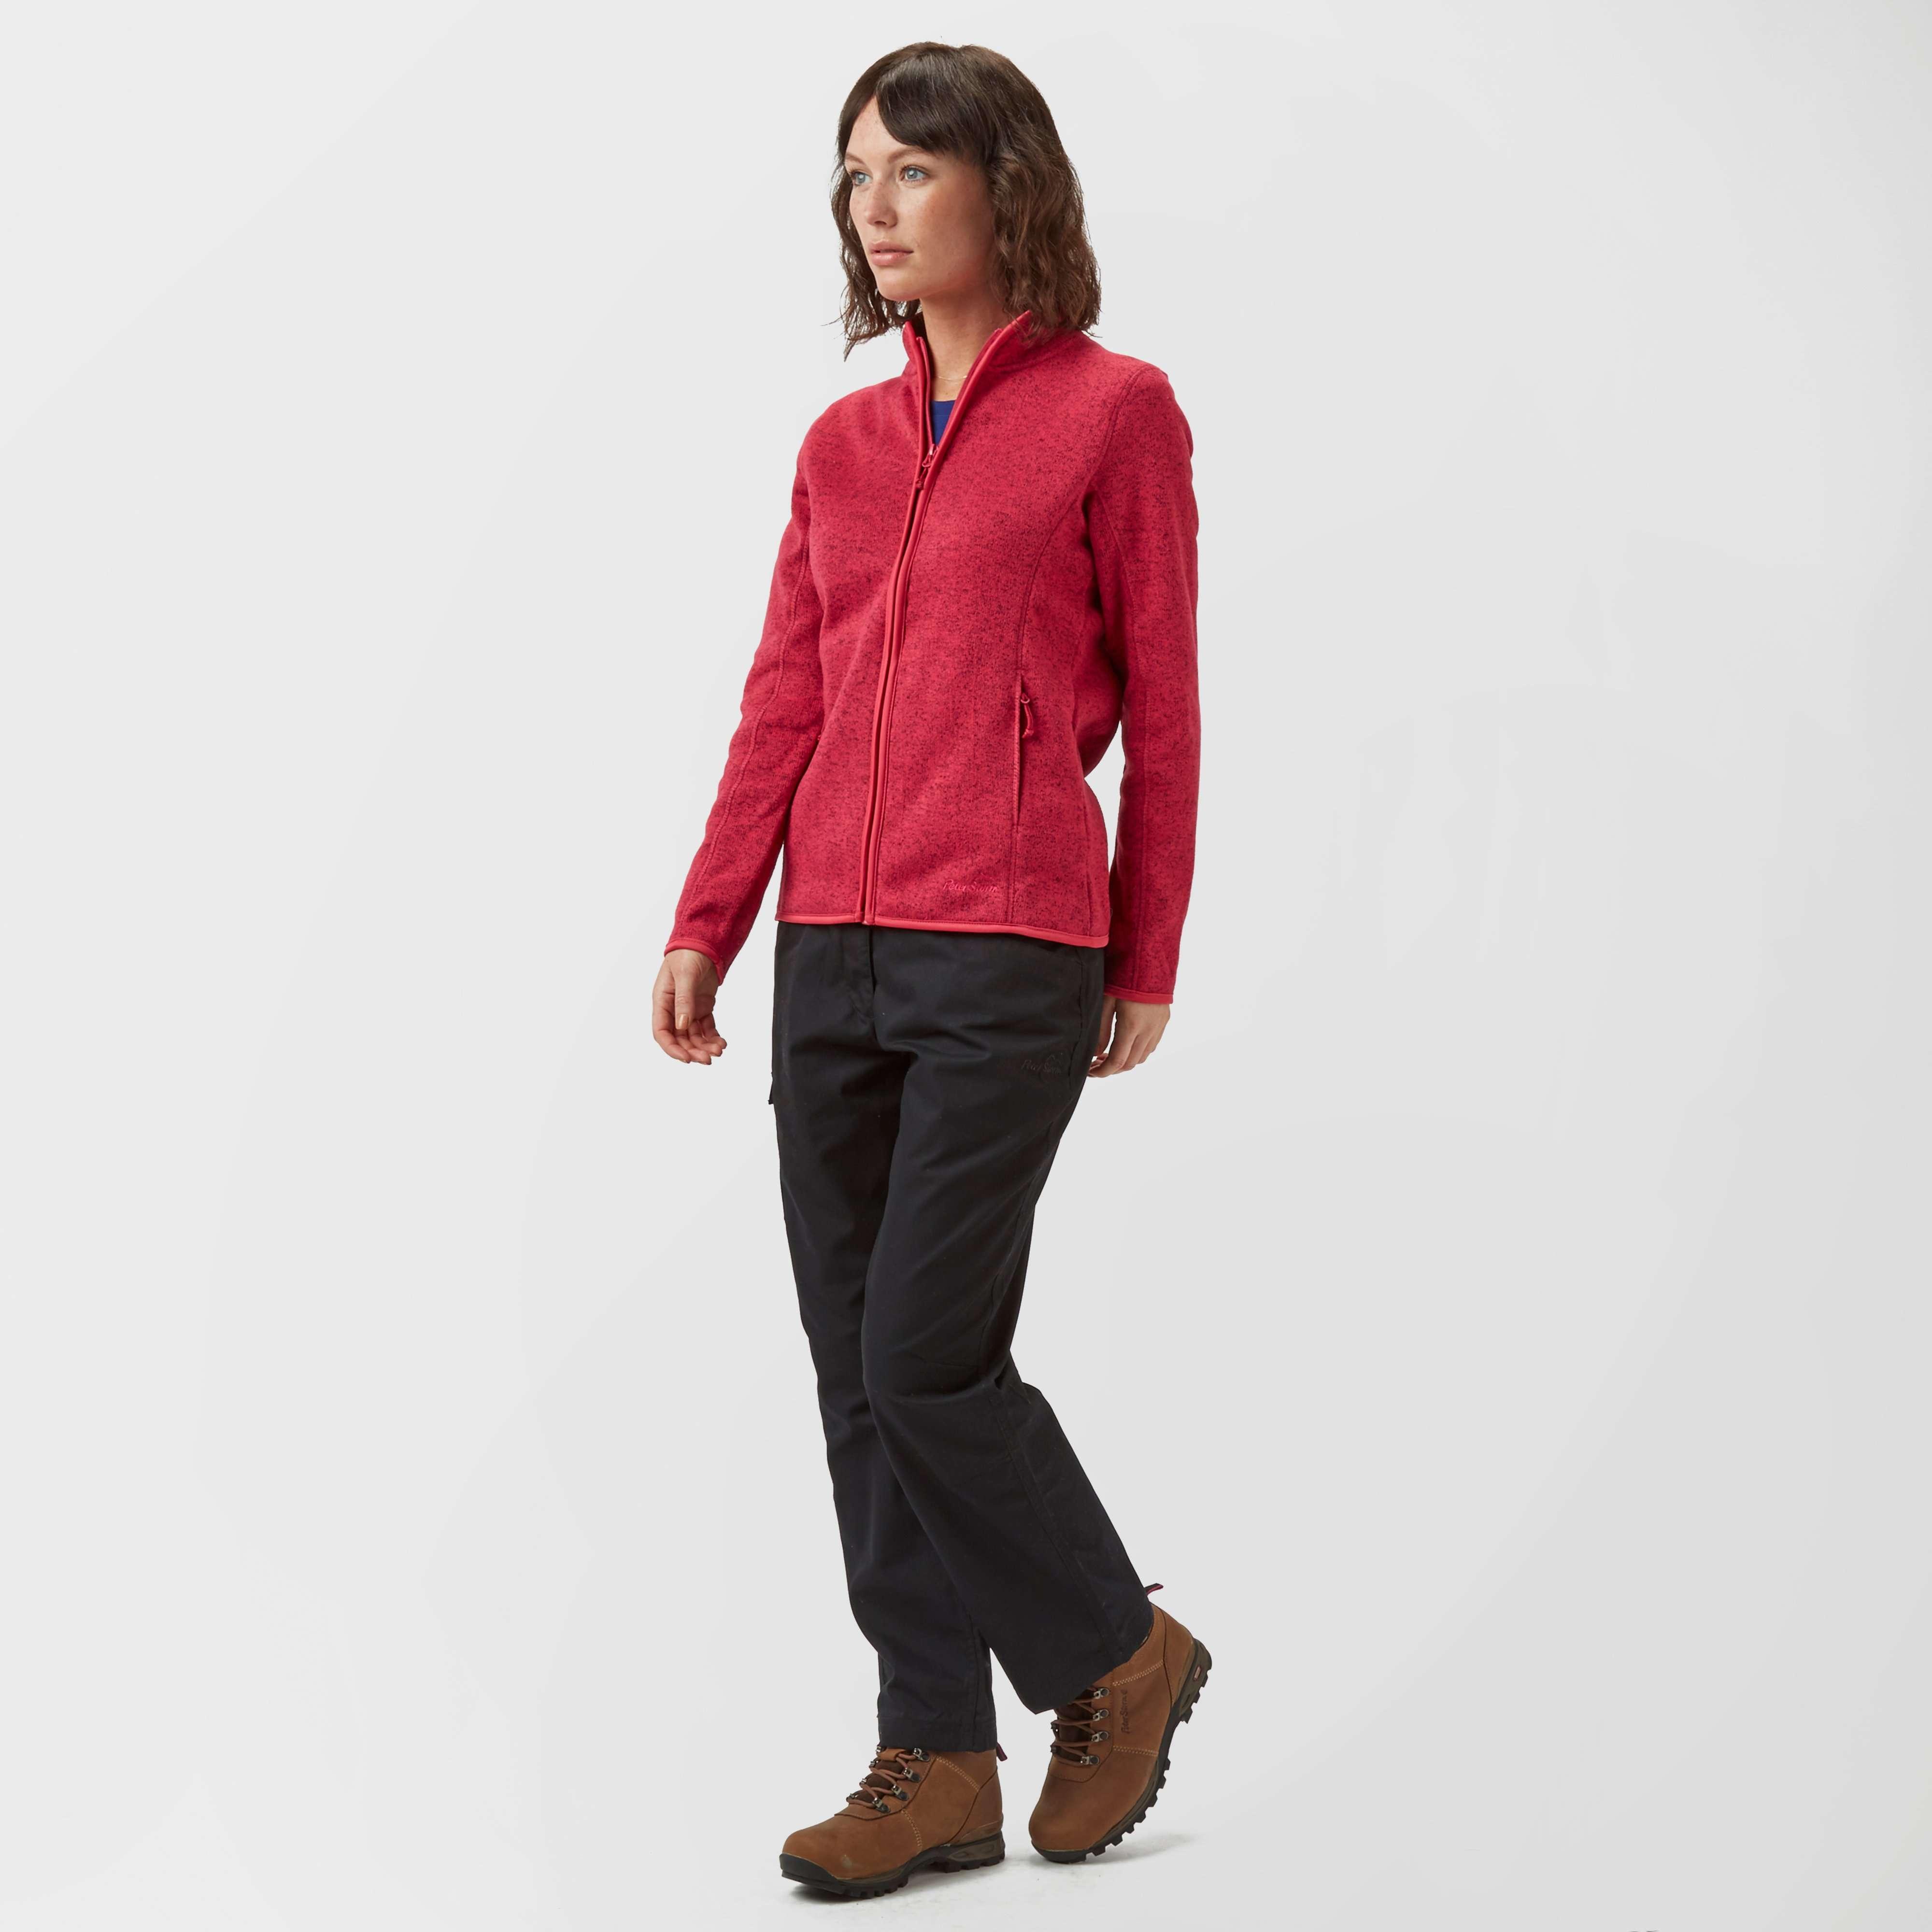 PETER STORM Women's Ramble II Trousers